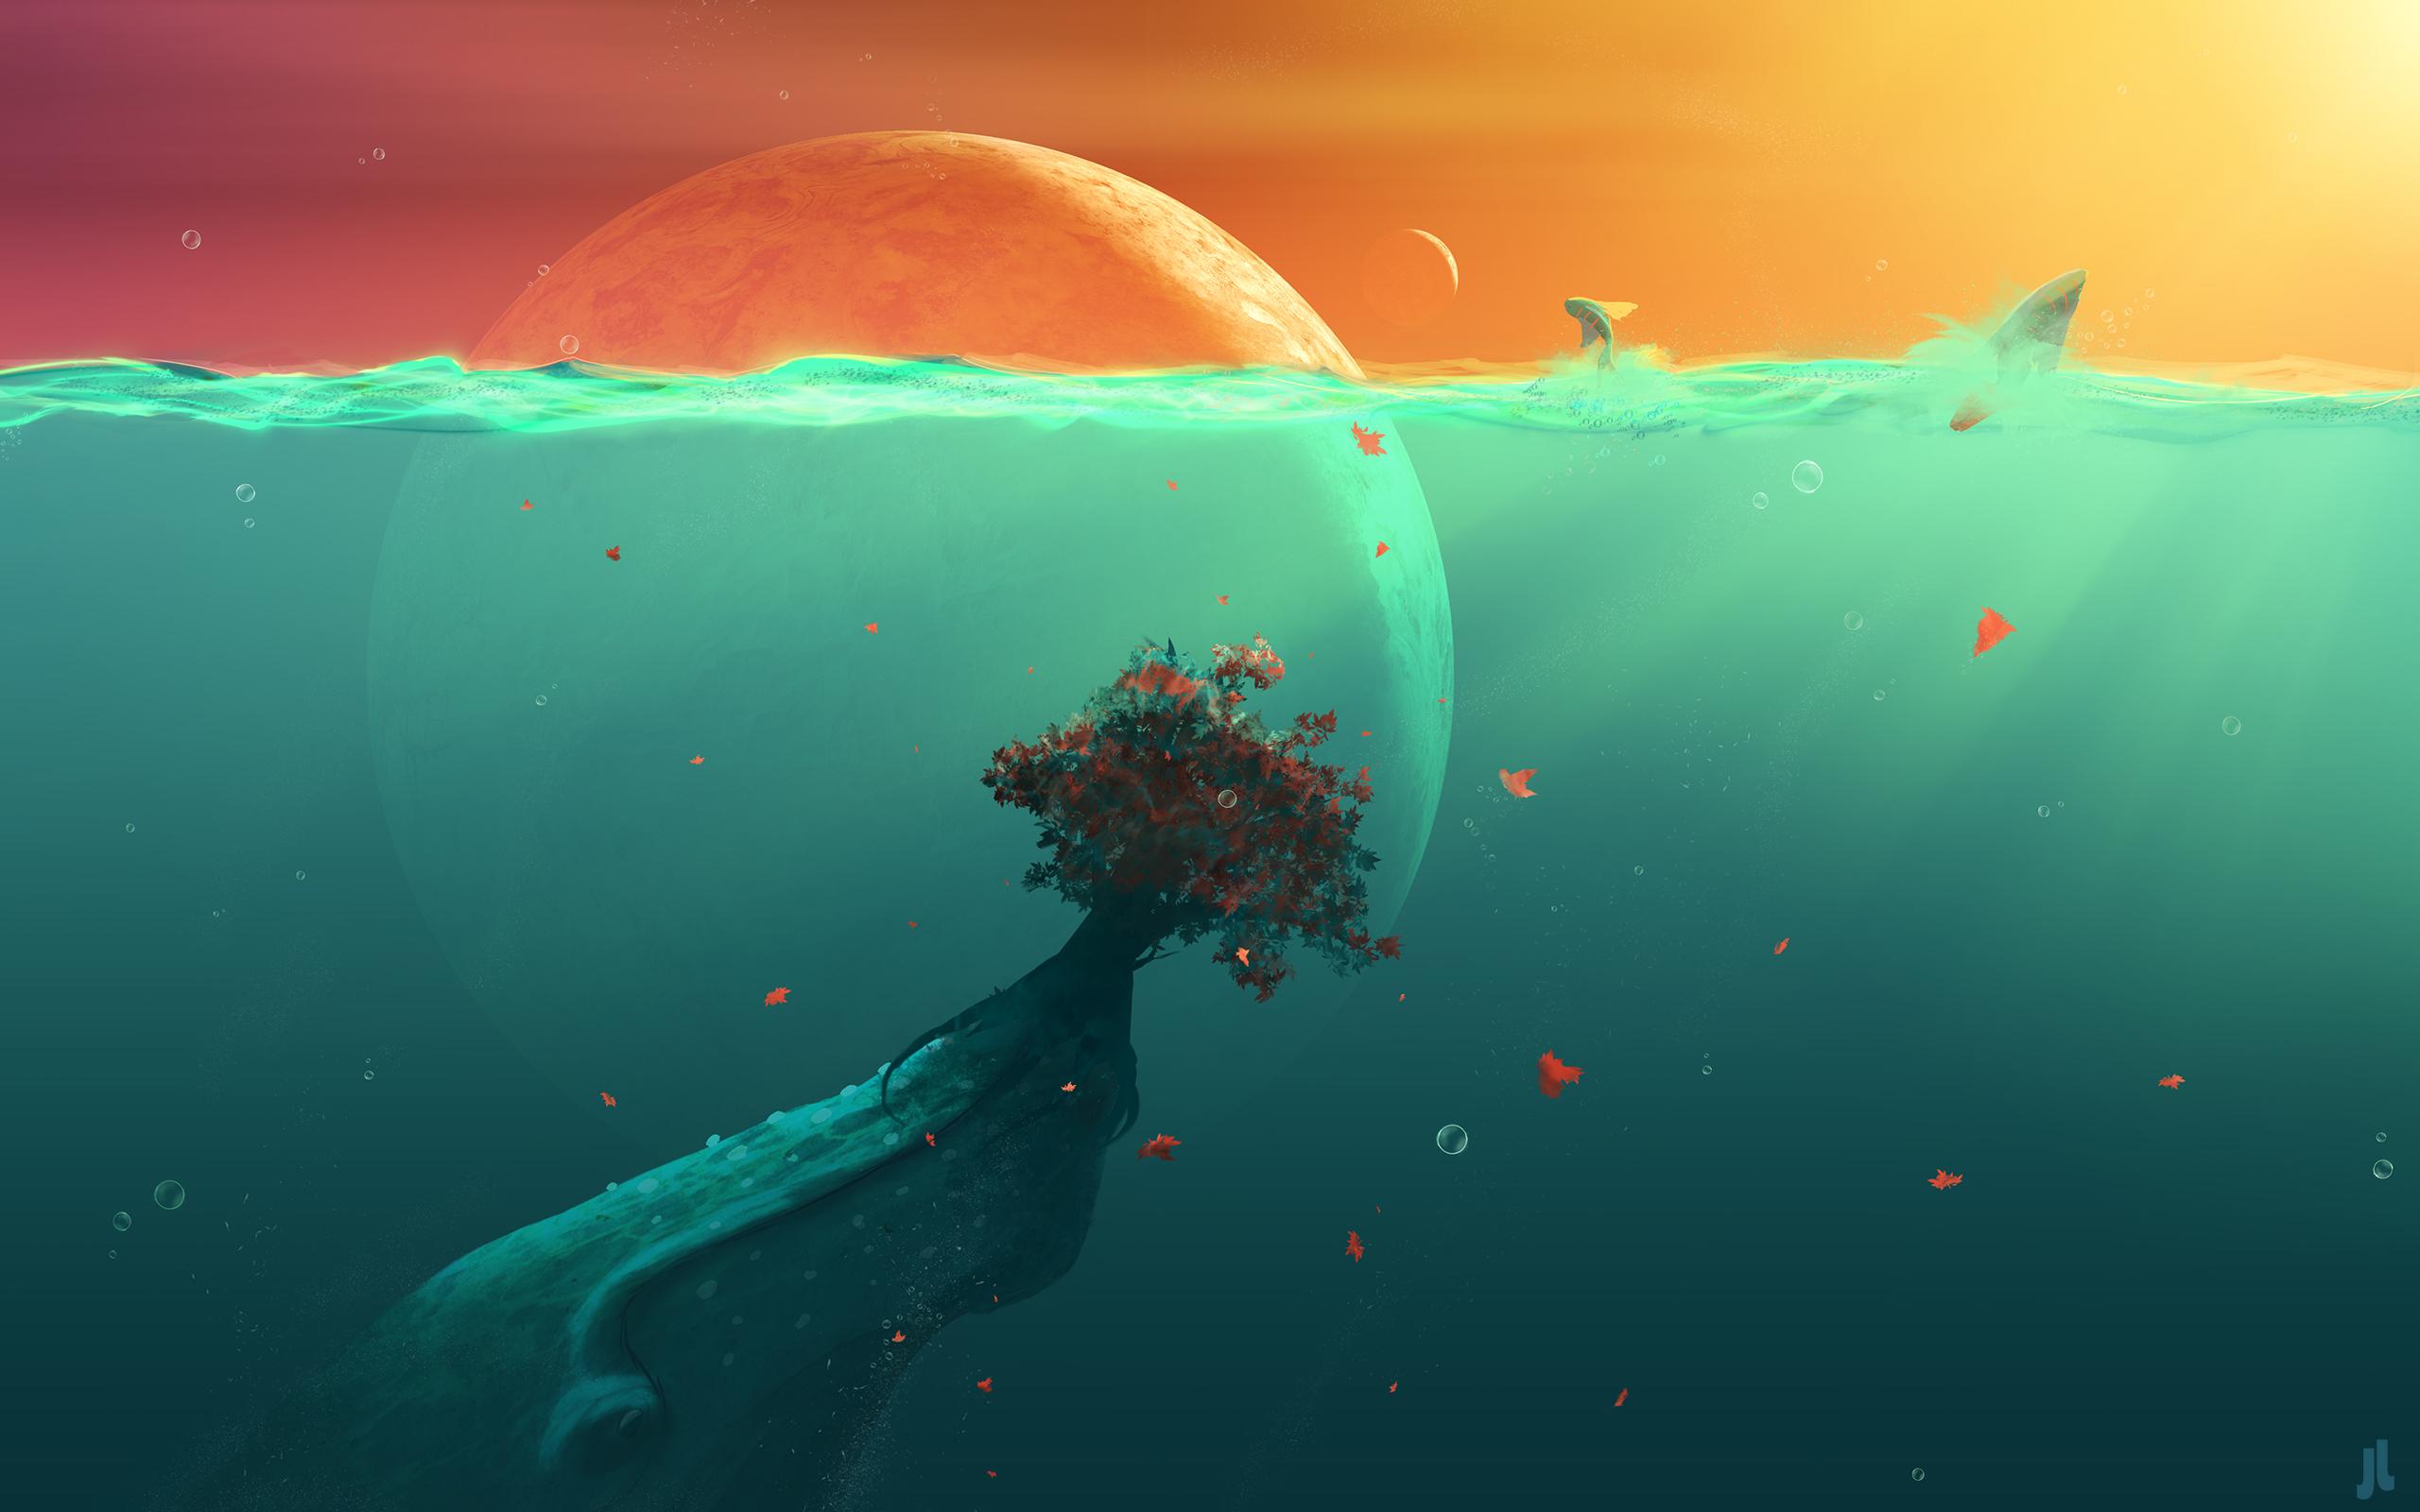 HD Wallpapers Deep Ocean Planet Fish